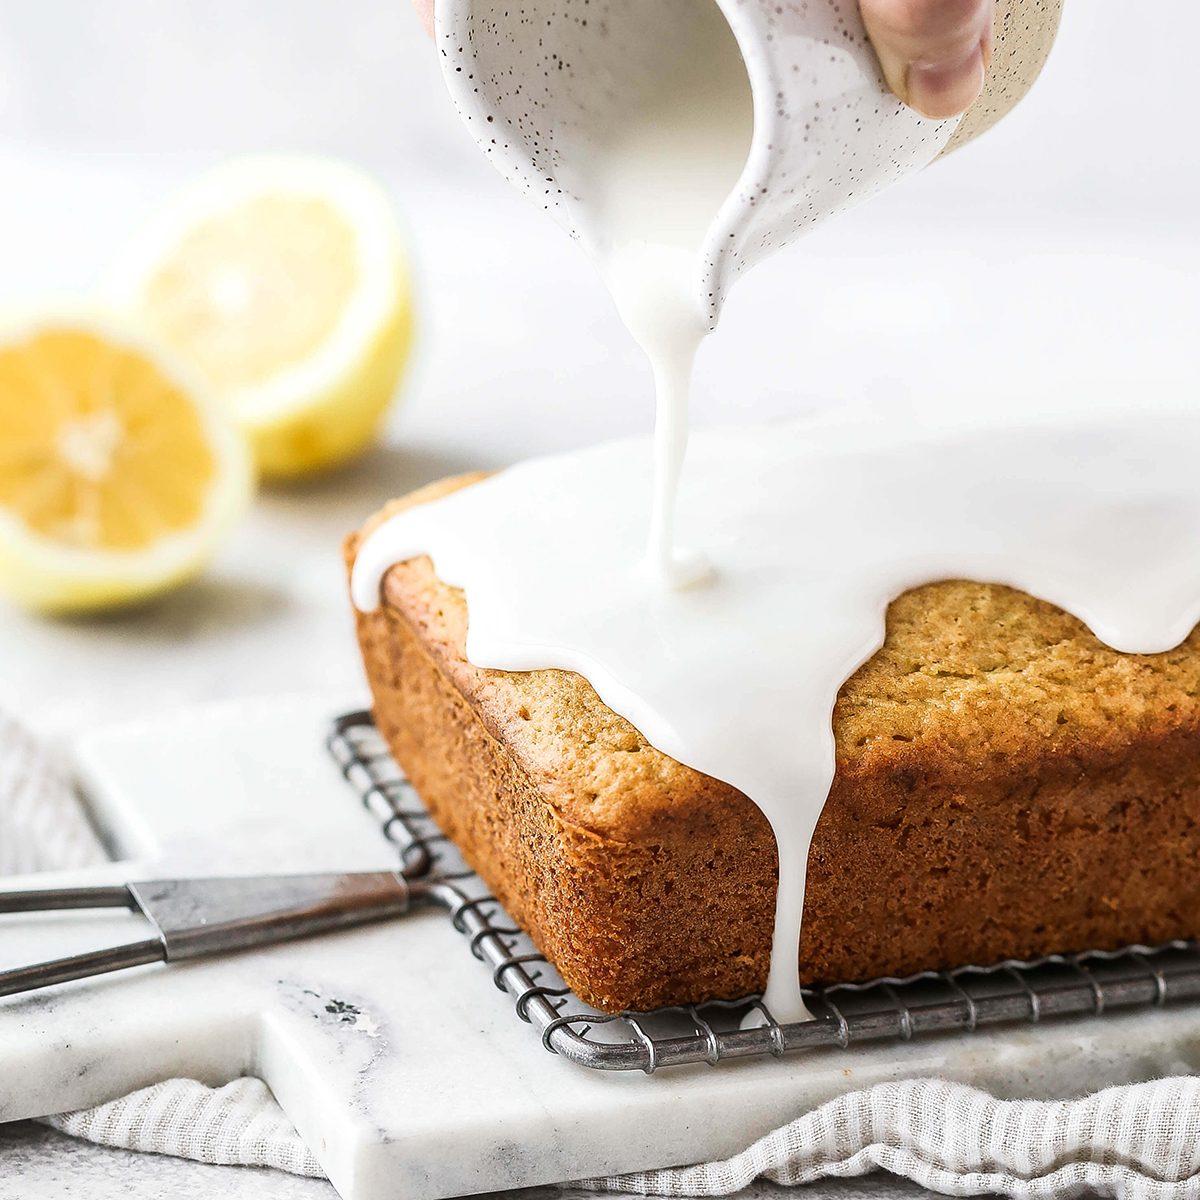 LEMON ZUCCHINI BREAD (GLUTEN FREE & DAIRY FREE)